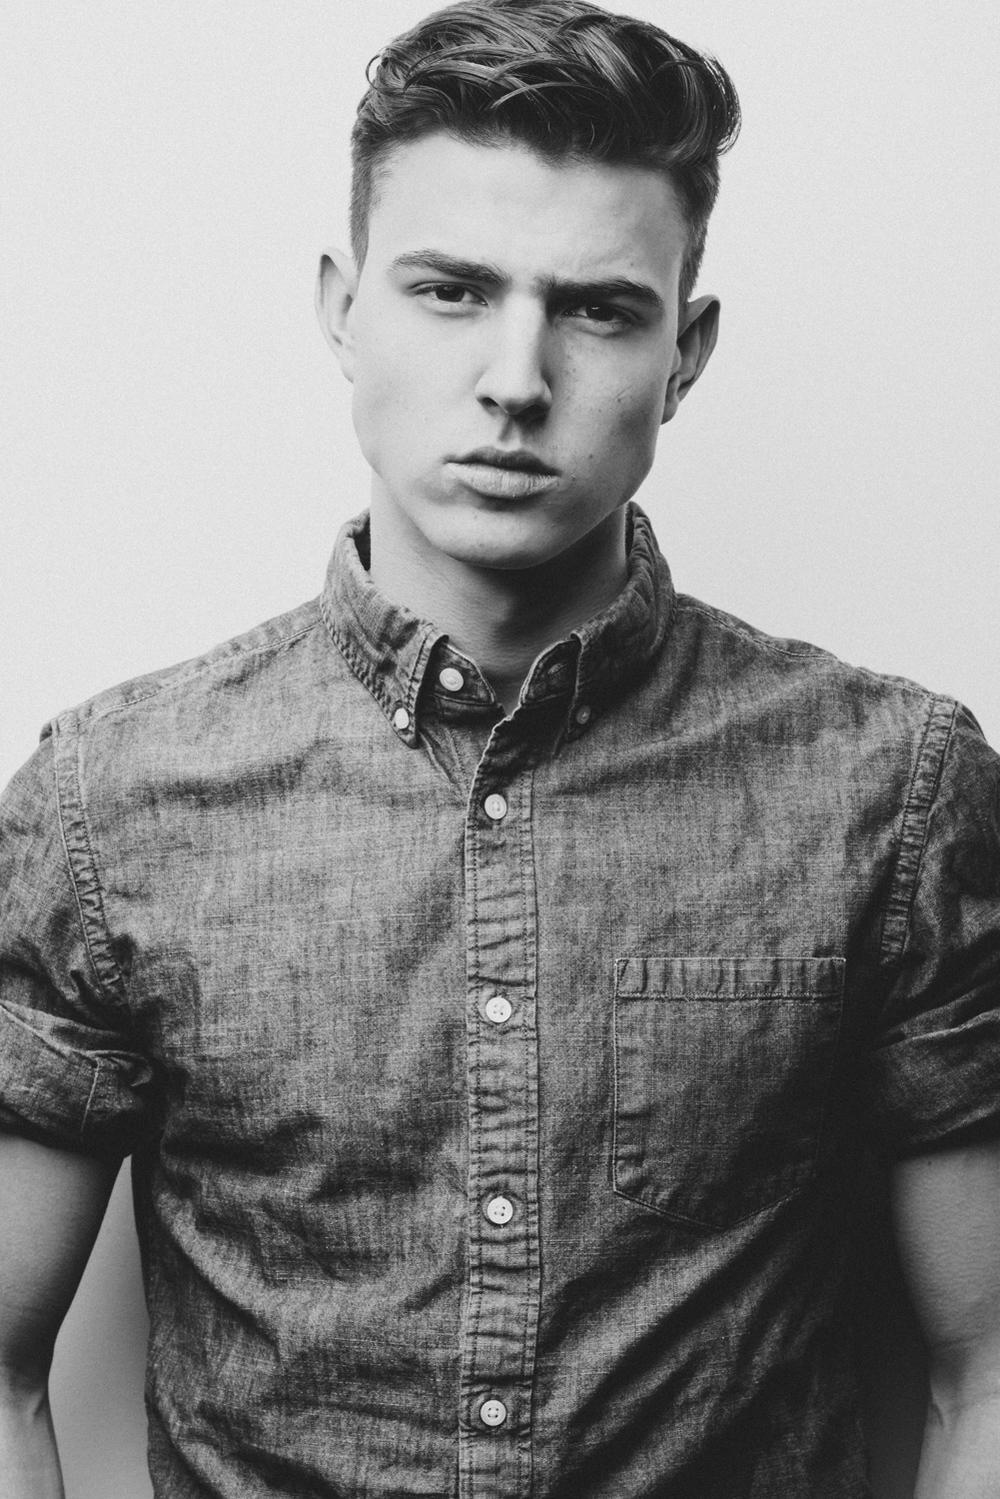 Nathan-52.jpg